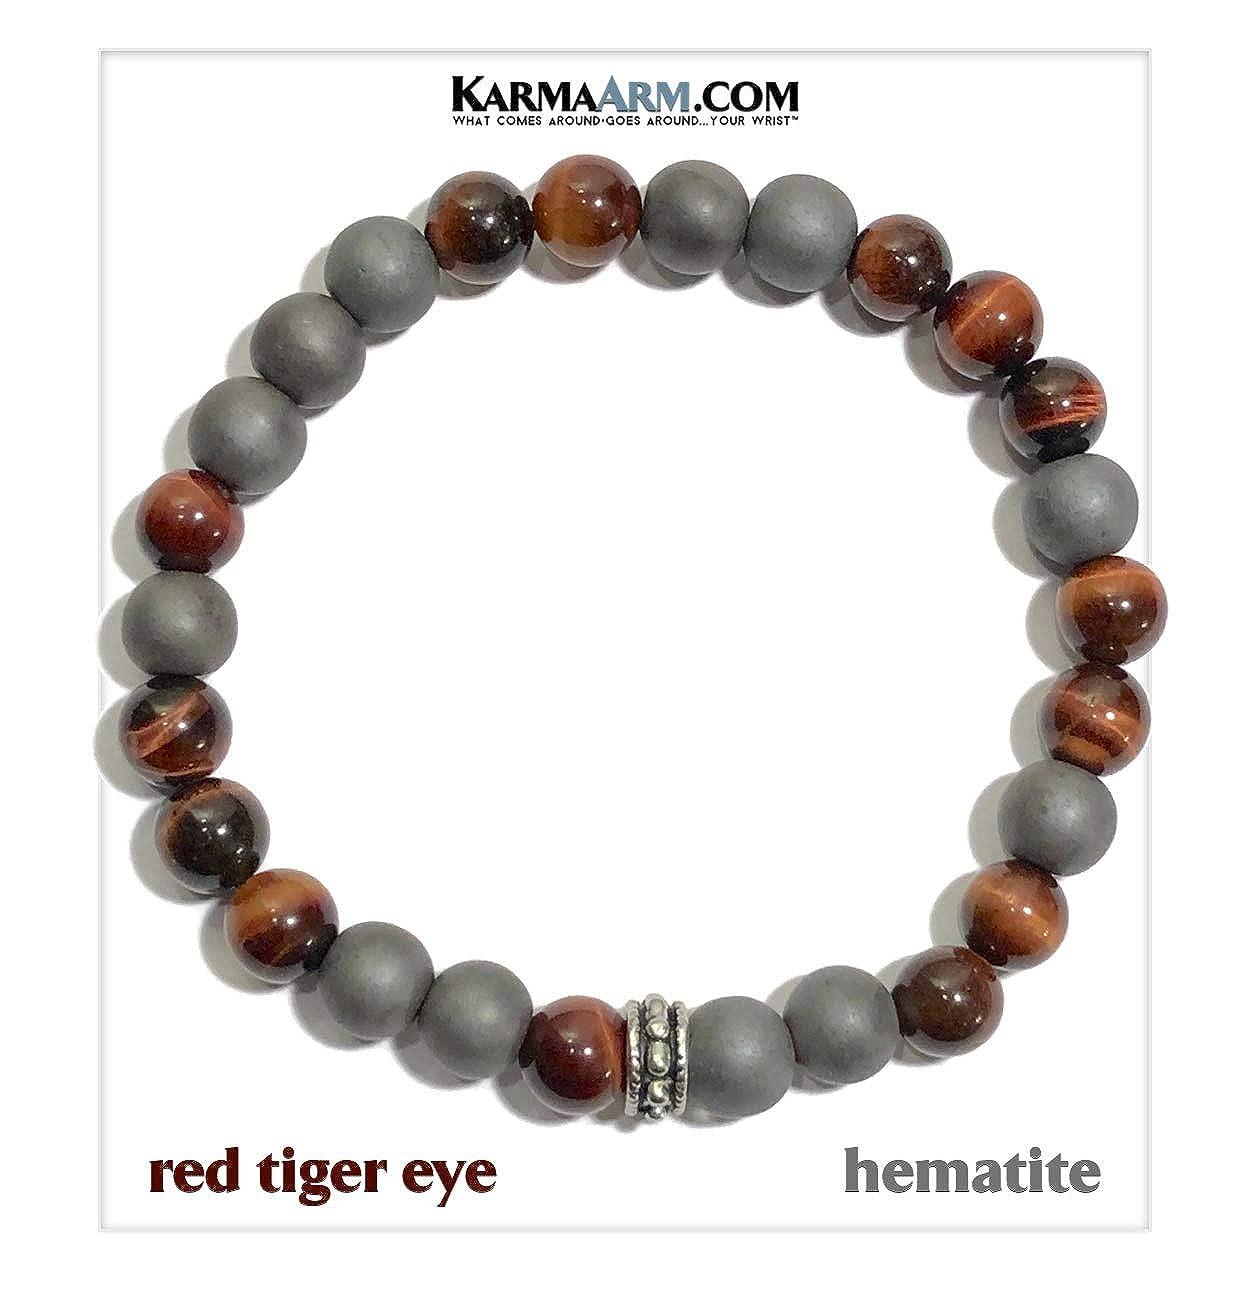 Amazon.com: KarmaArm Energy | Red Tiger Eye | Hematite ...